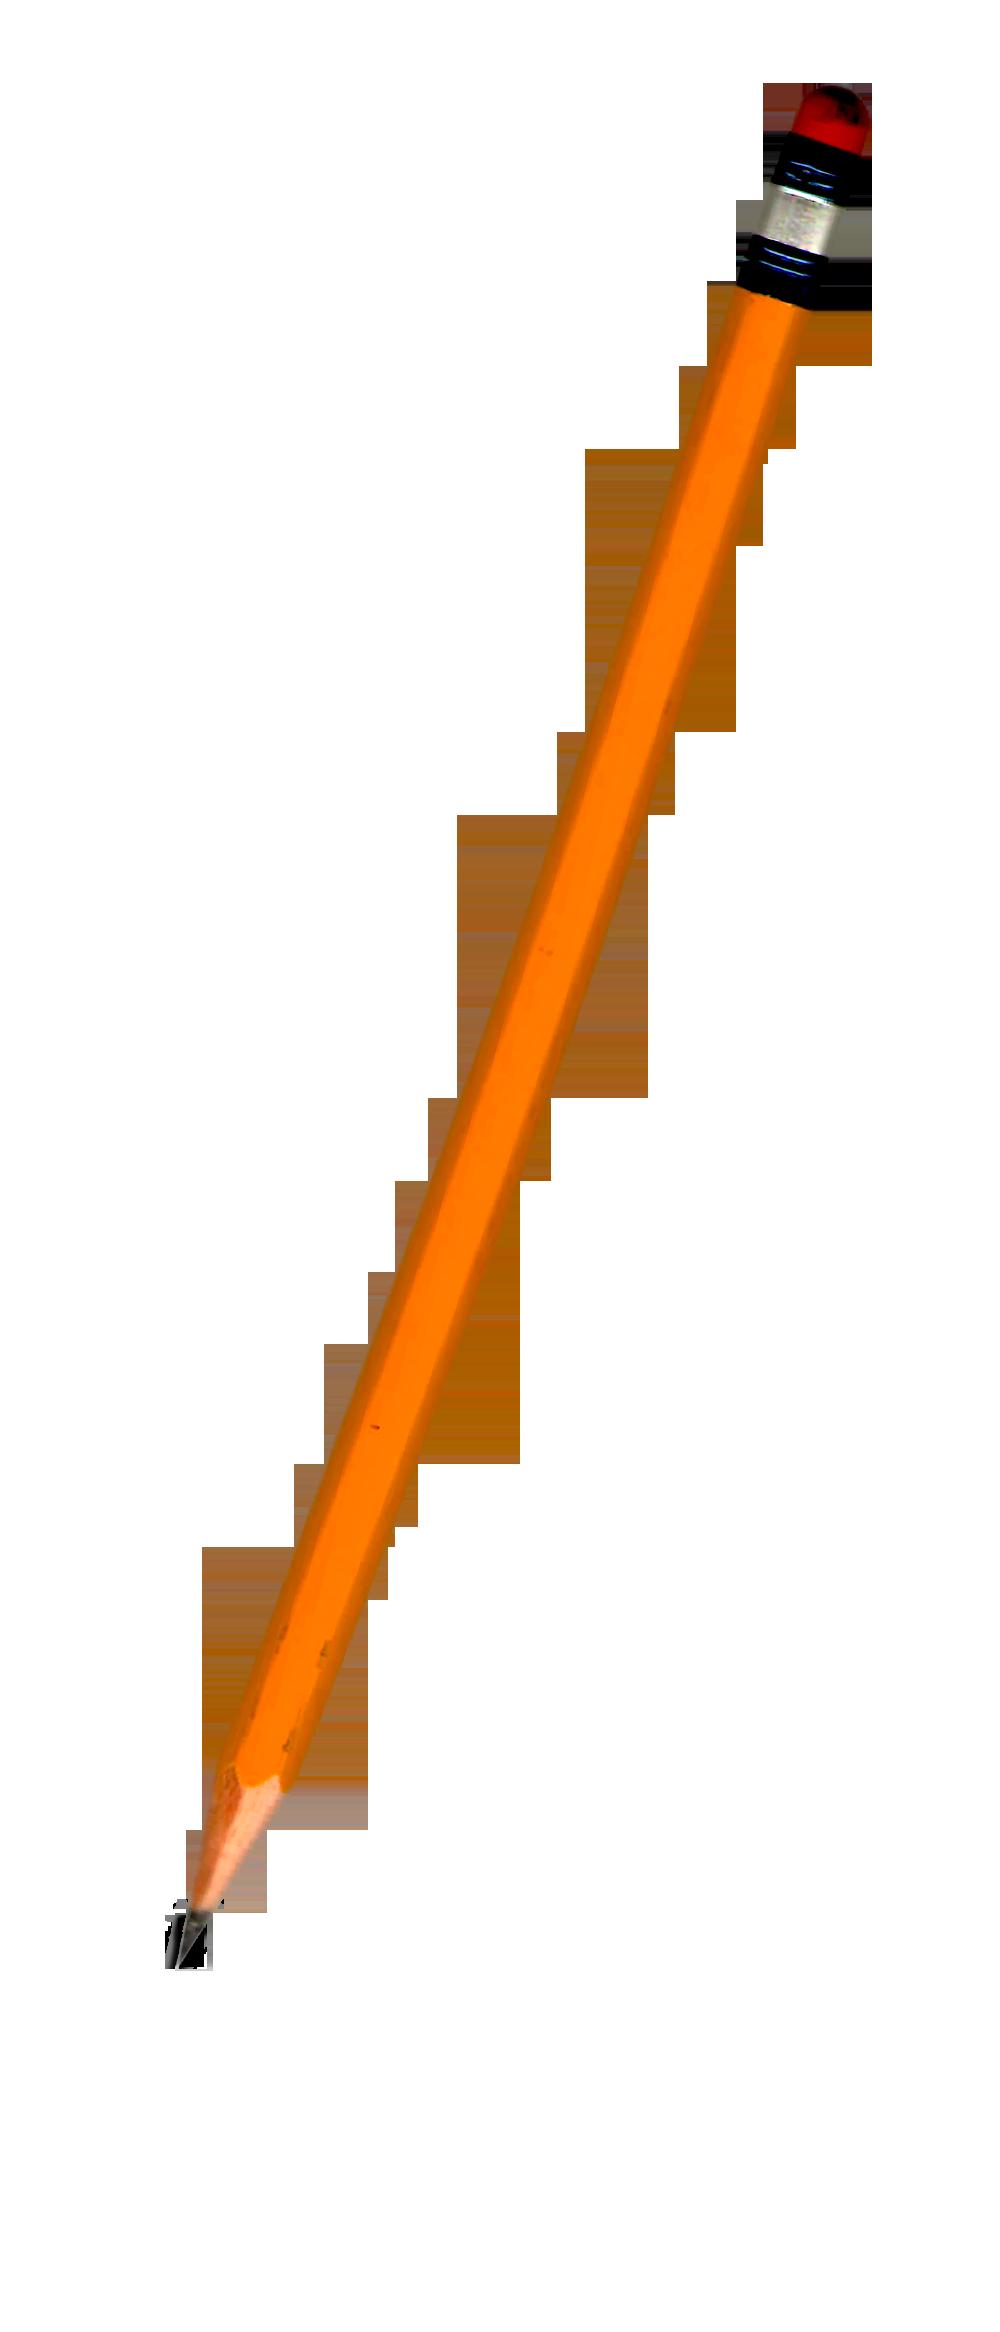 Pencil png file